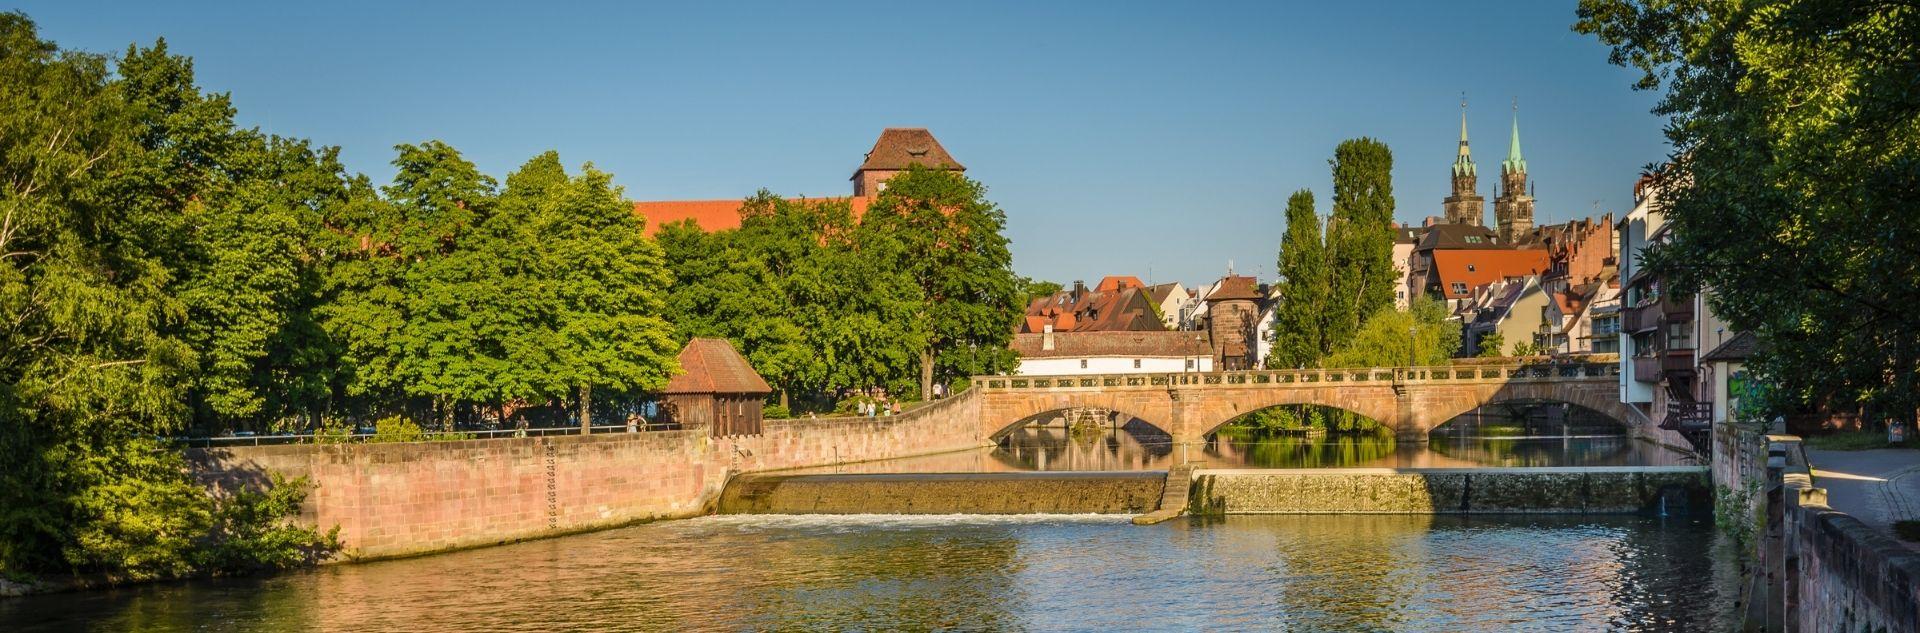 Stadtansicht Nürnberg - Reisebüro Nürnberg